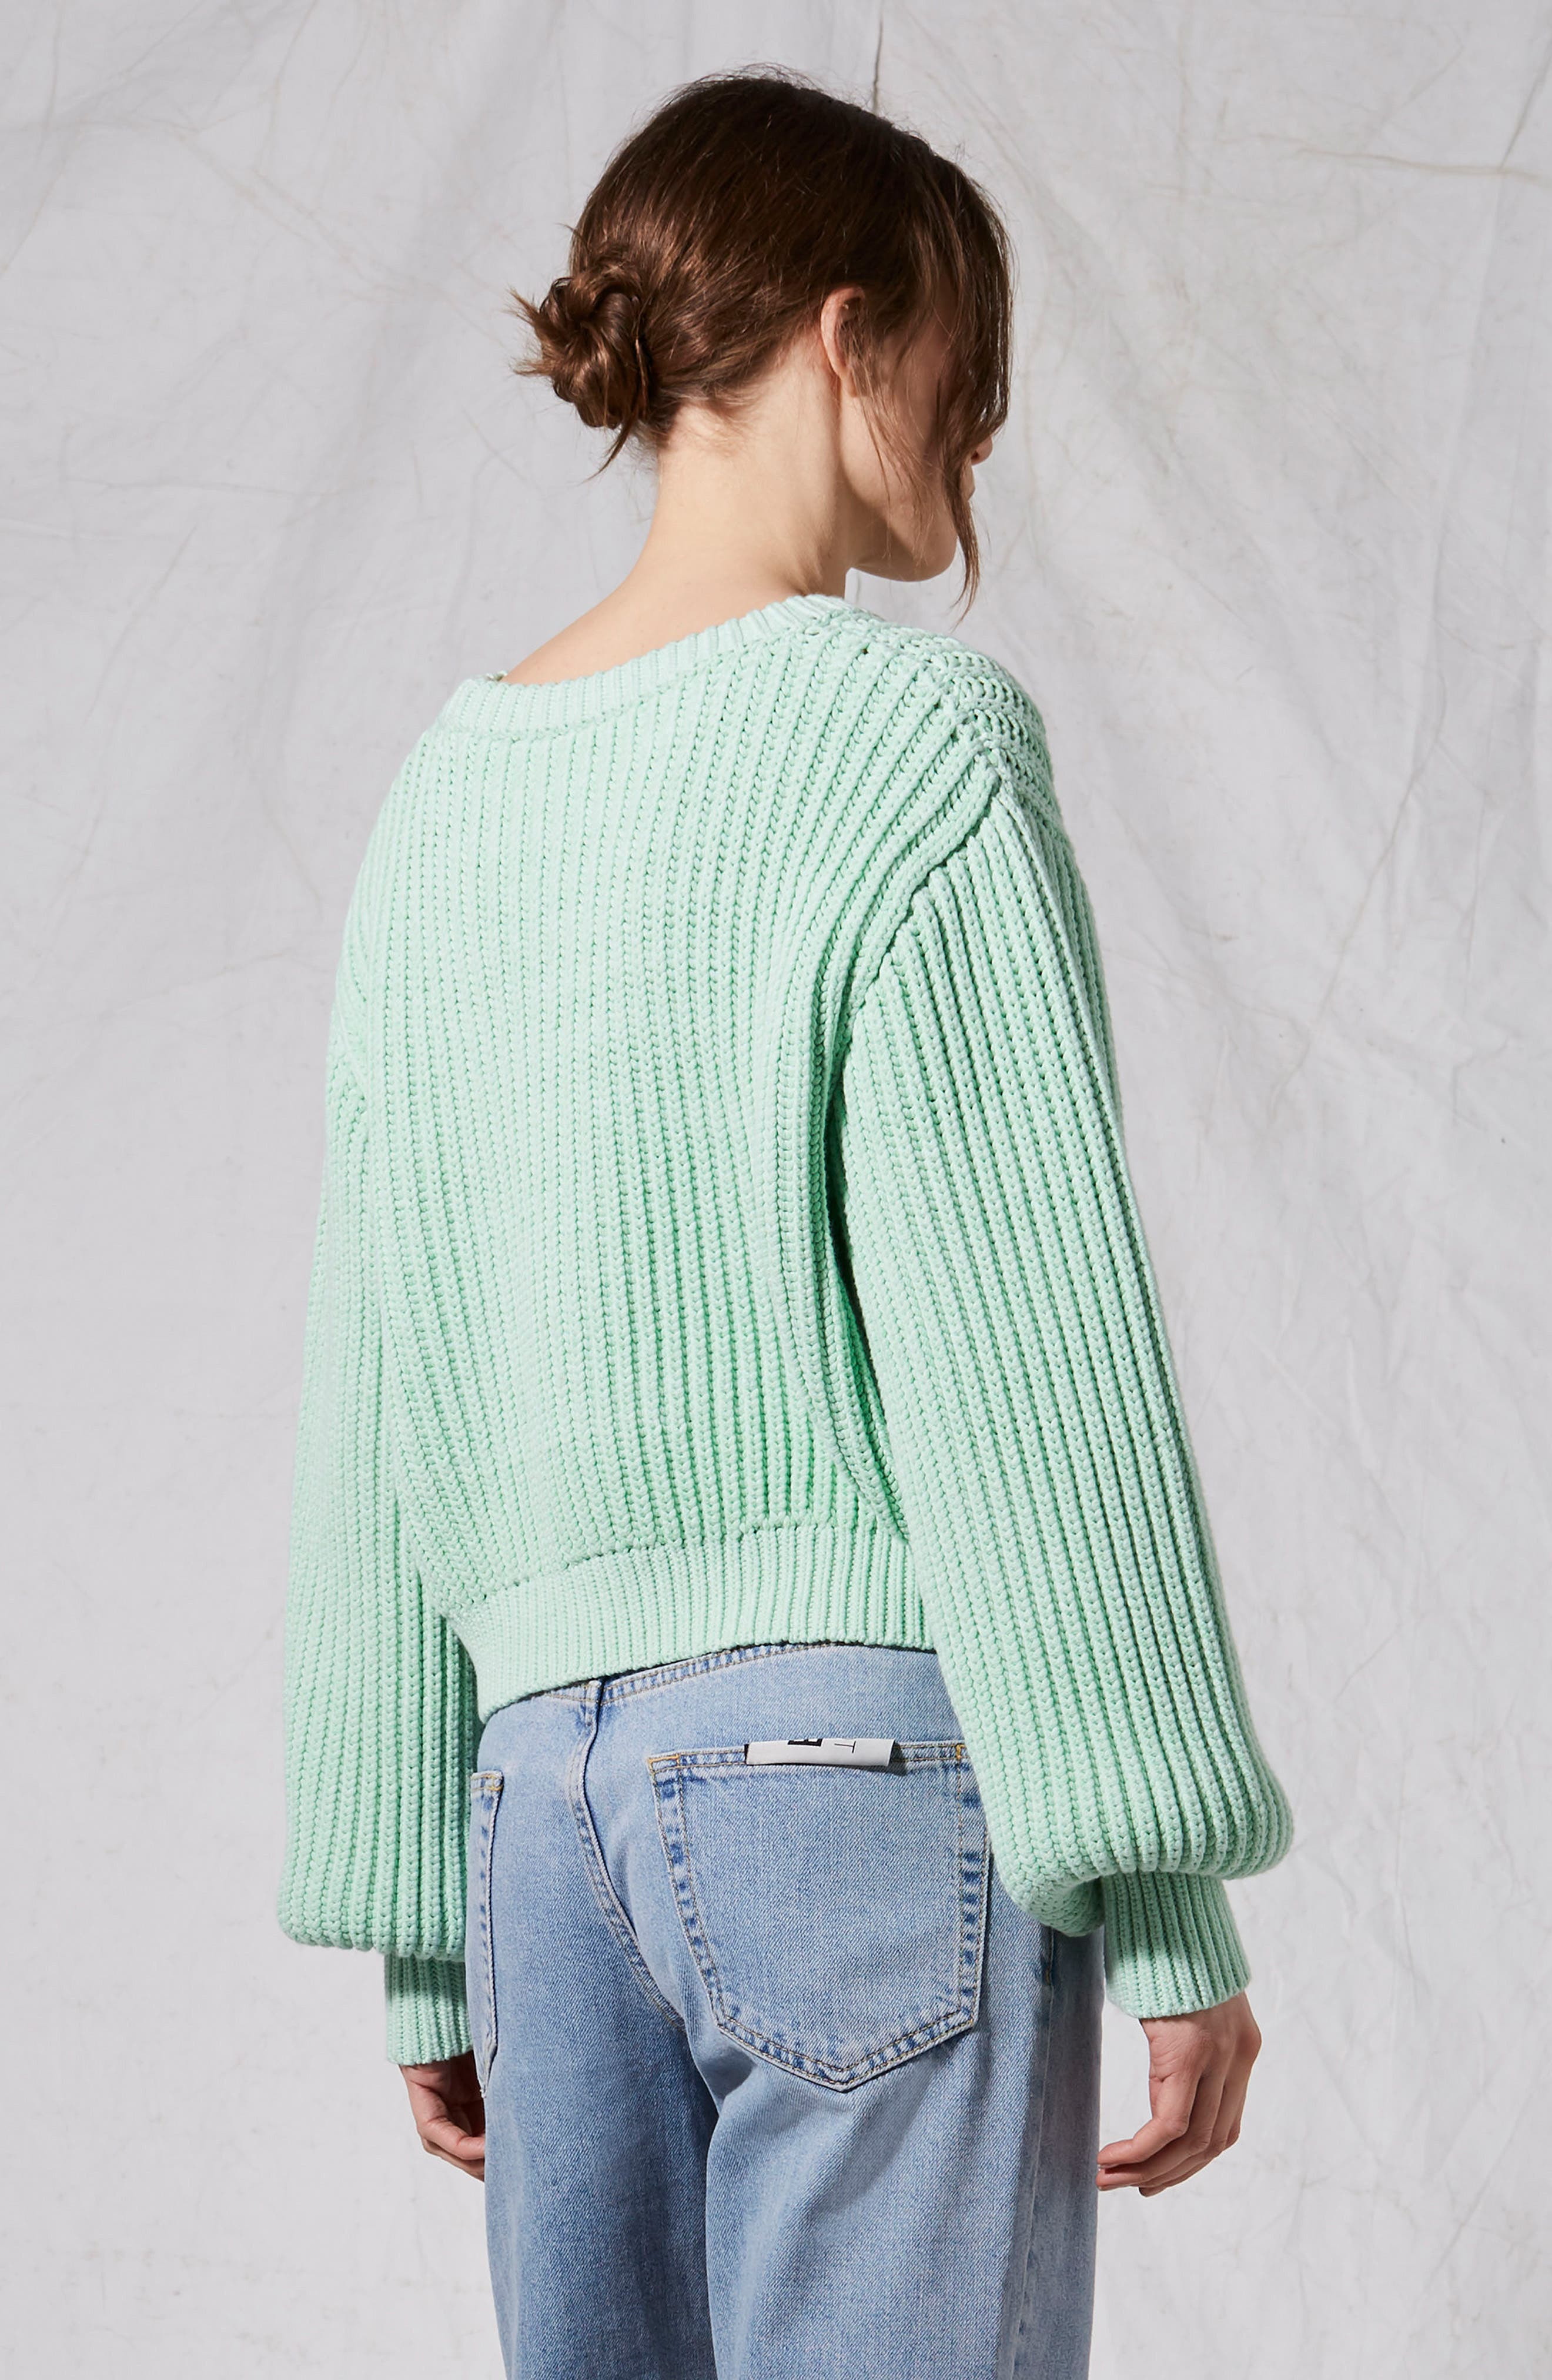 Fisherman Crewneck Sweater,                             Alternate thumbnail 2, color,                             Light Green